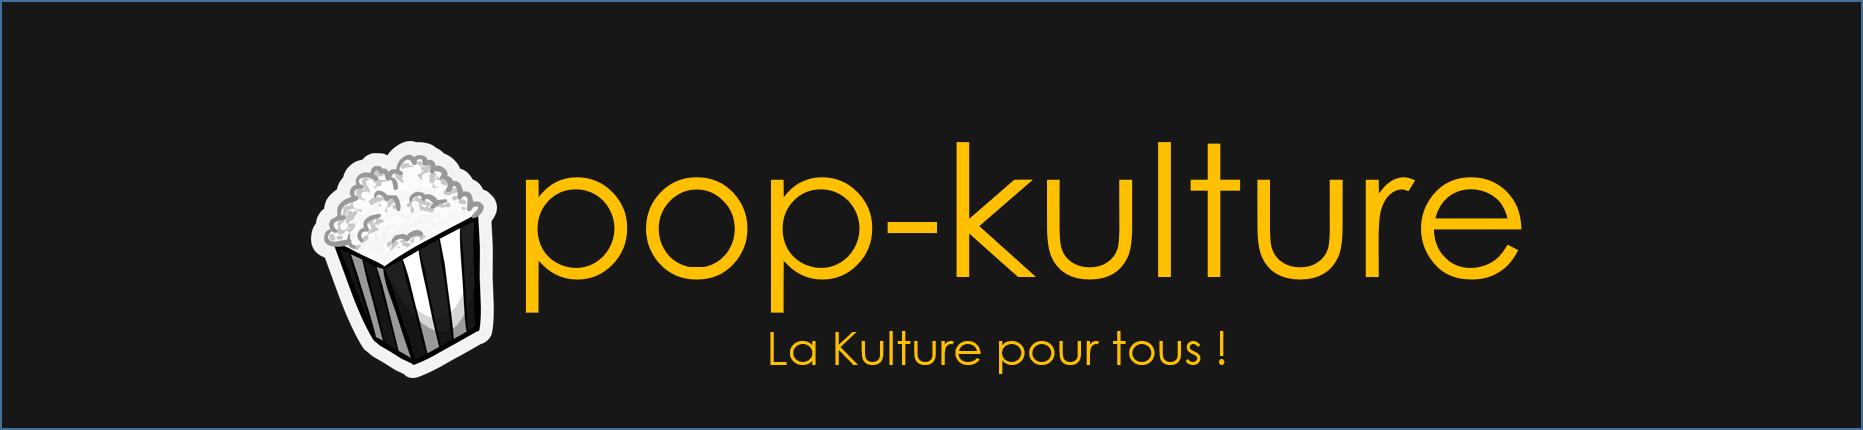 pop-kulture-logo-4